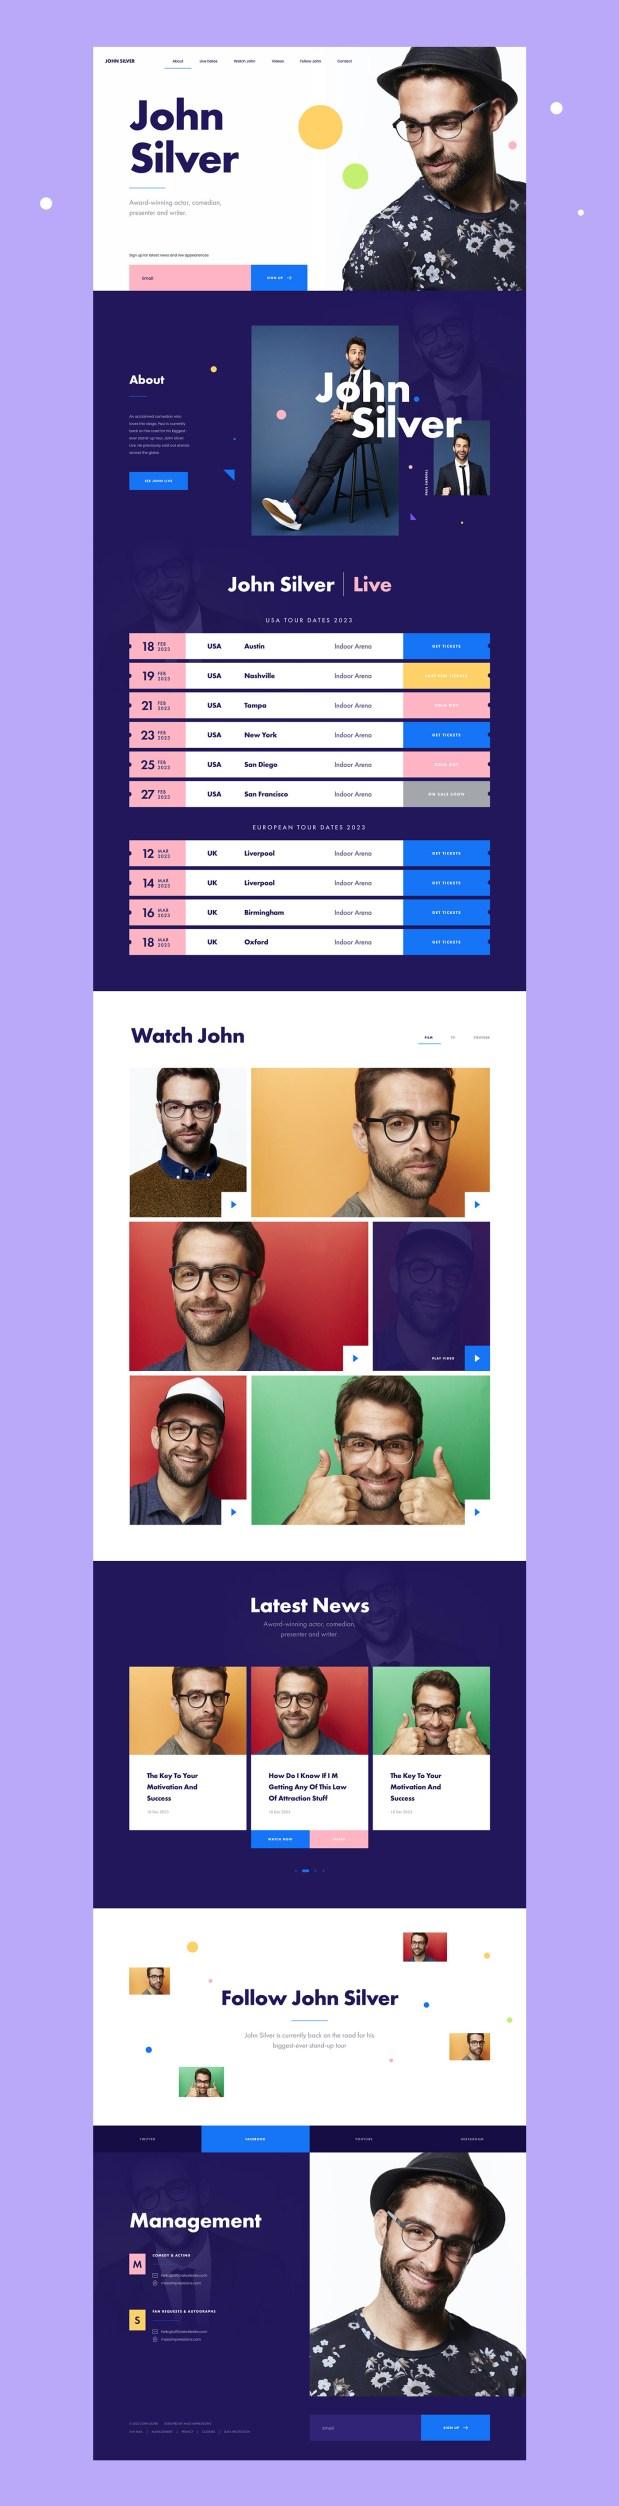 MI Comedian — Free Sketch App Website Template